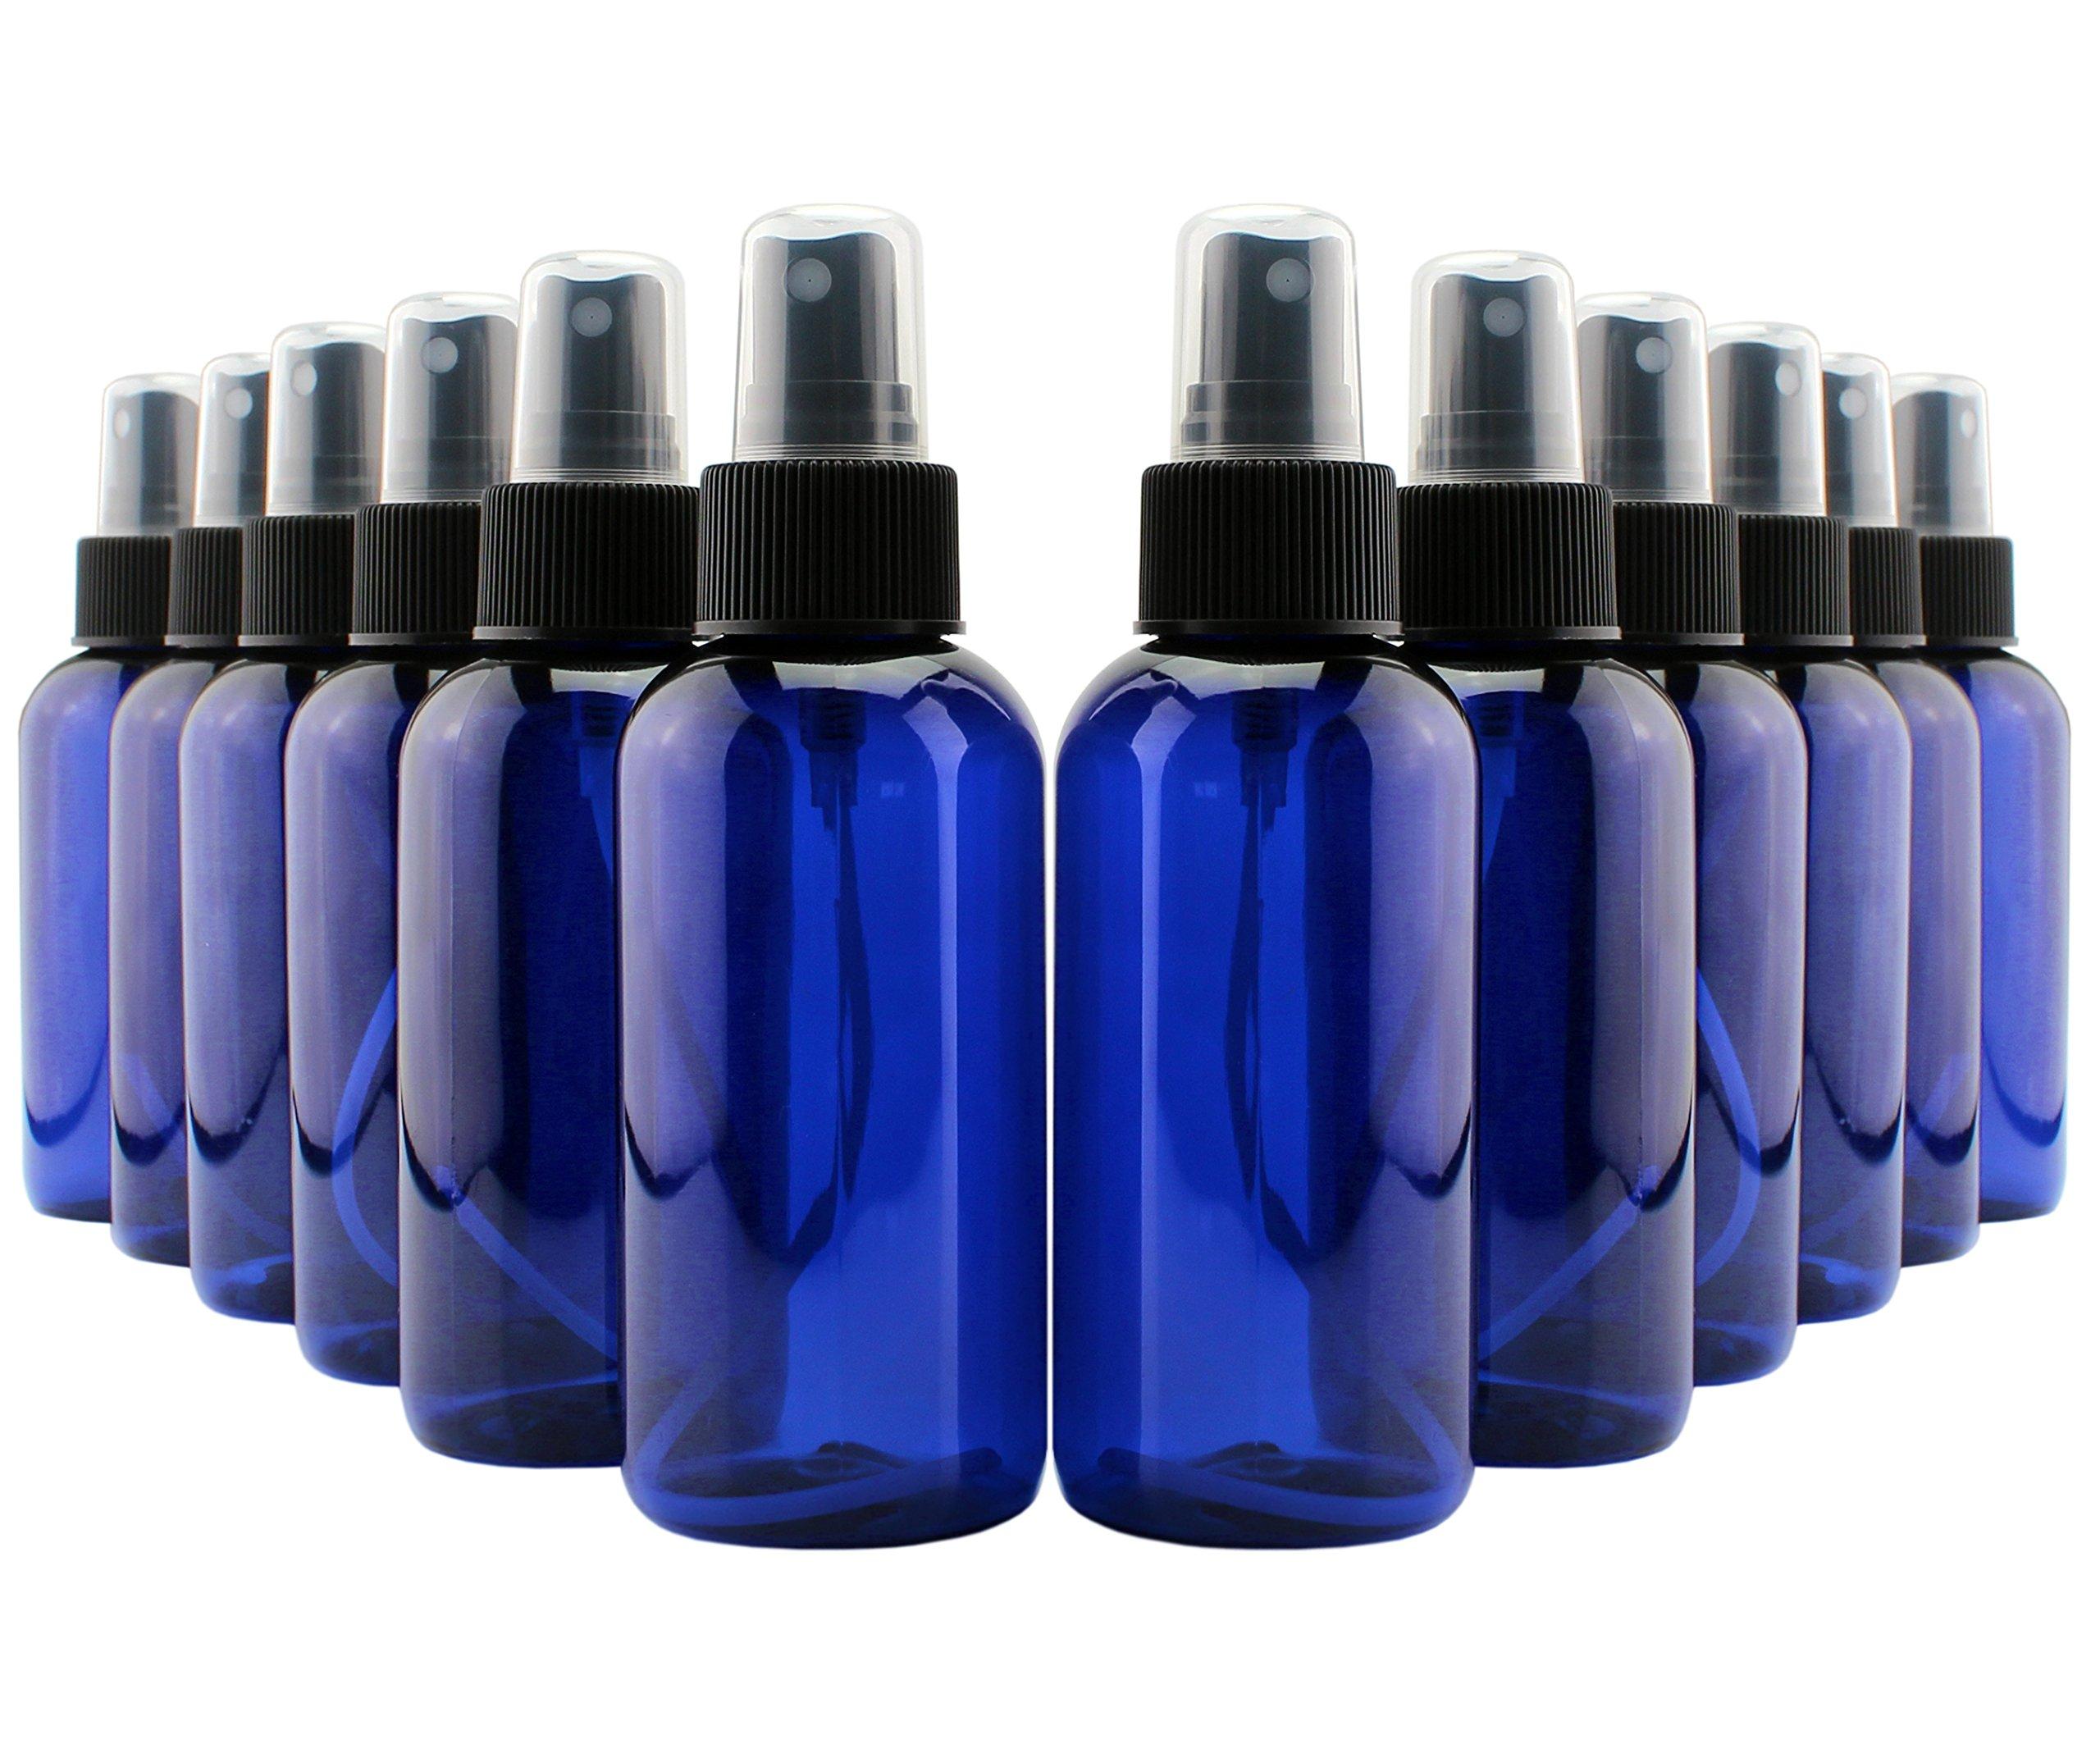 4oz Cobalt Blue Plastic PET Boston Round Fine Mist Spray Bottles (12-Pack w/Black Sprayers); Labels Included